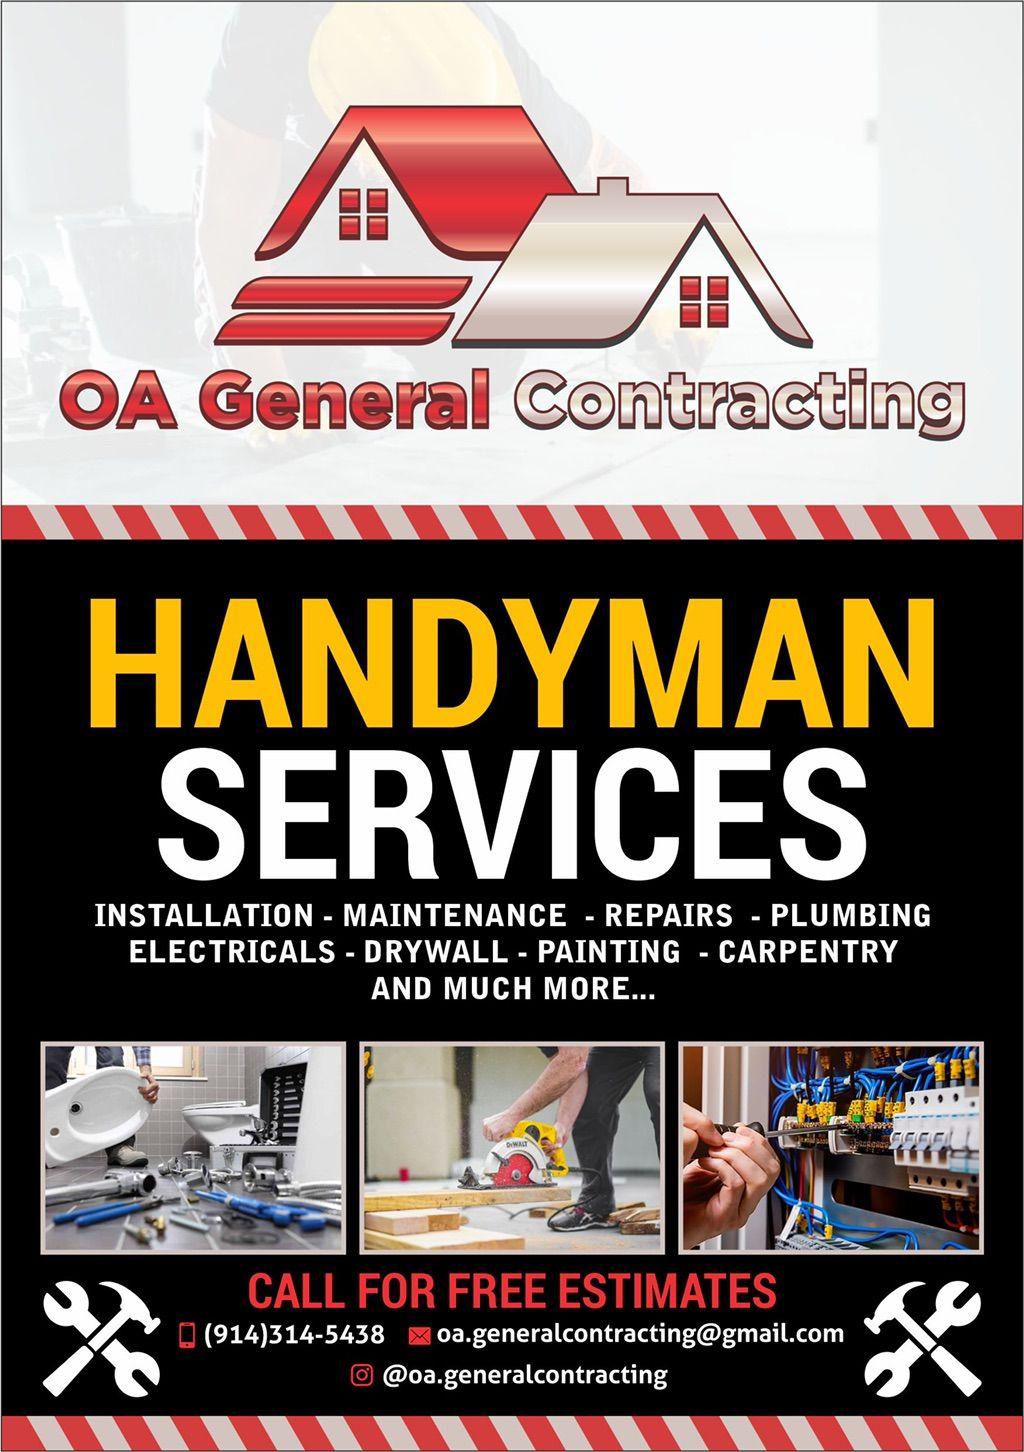 OA General Contracting